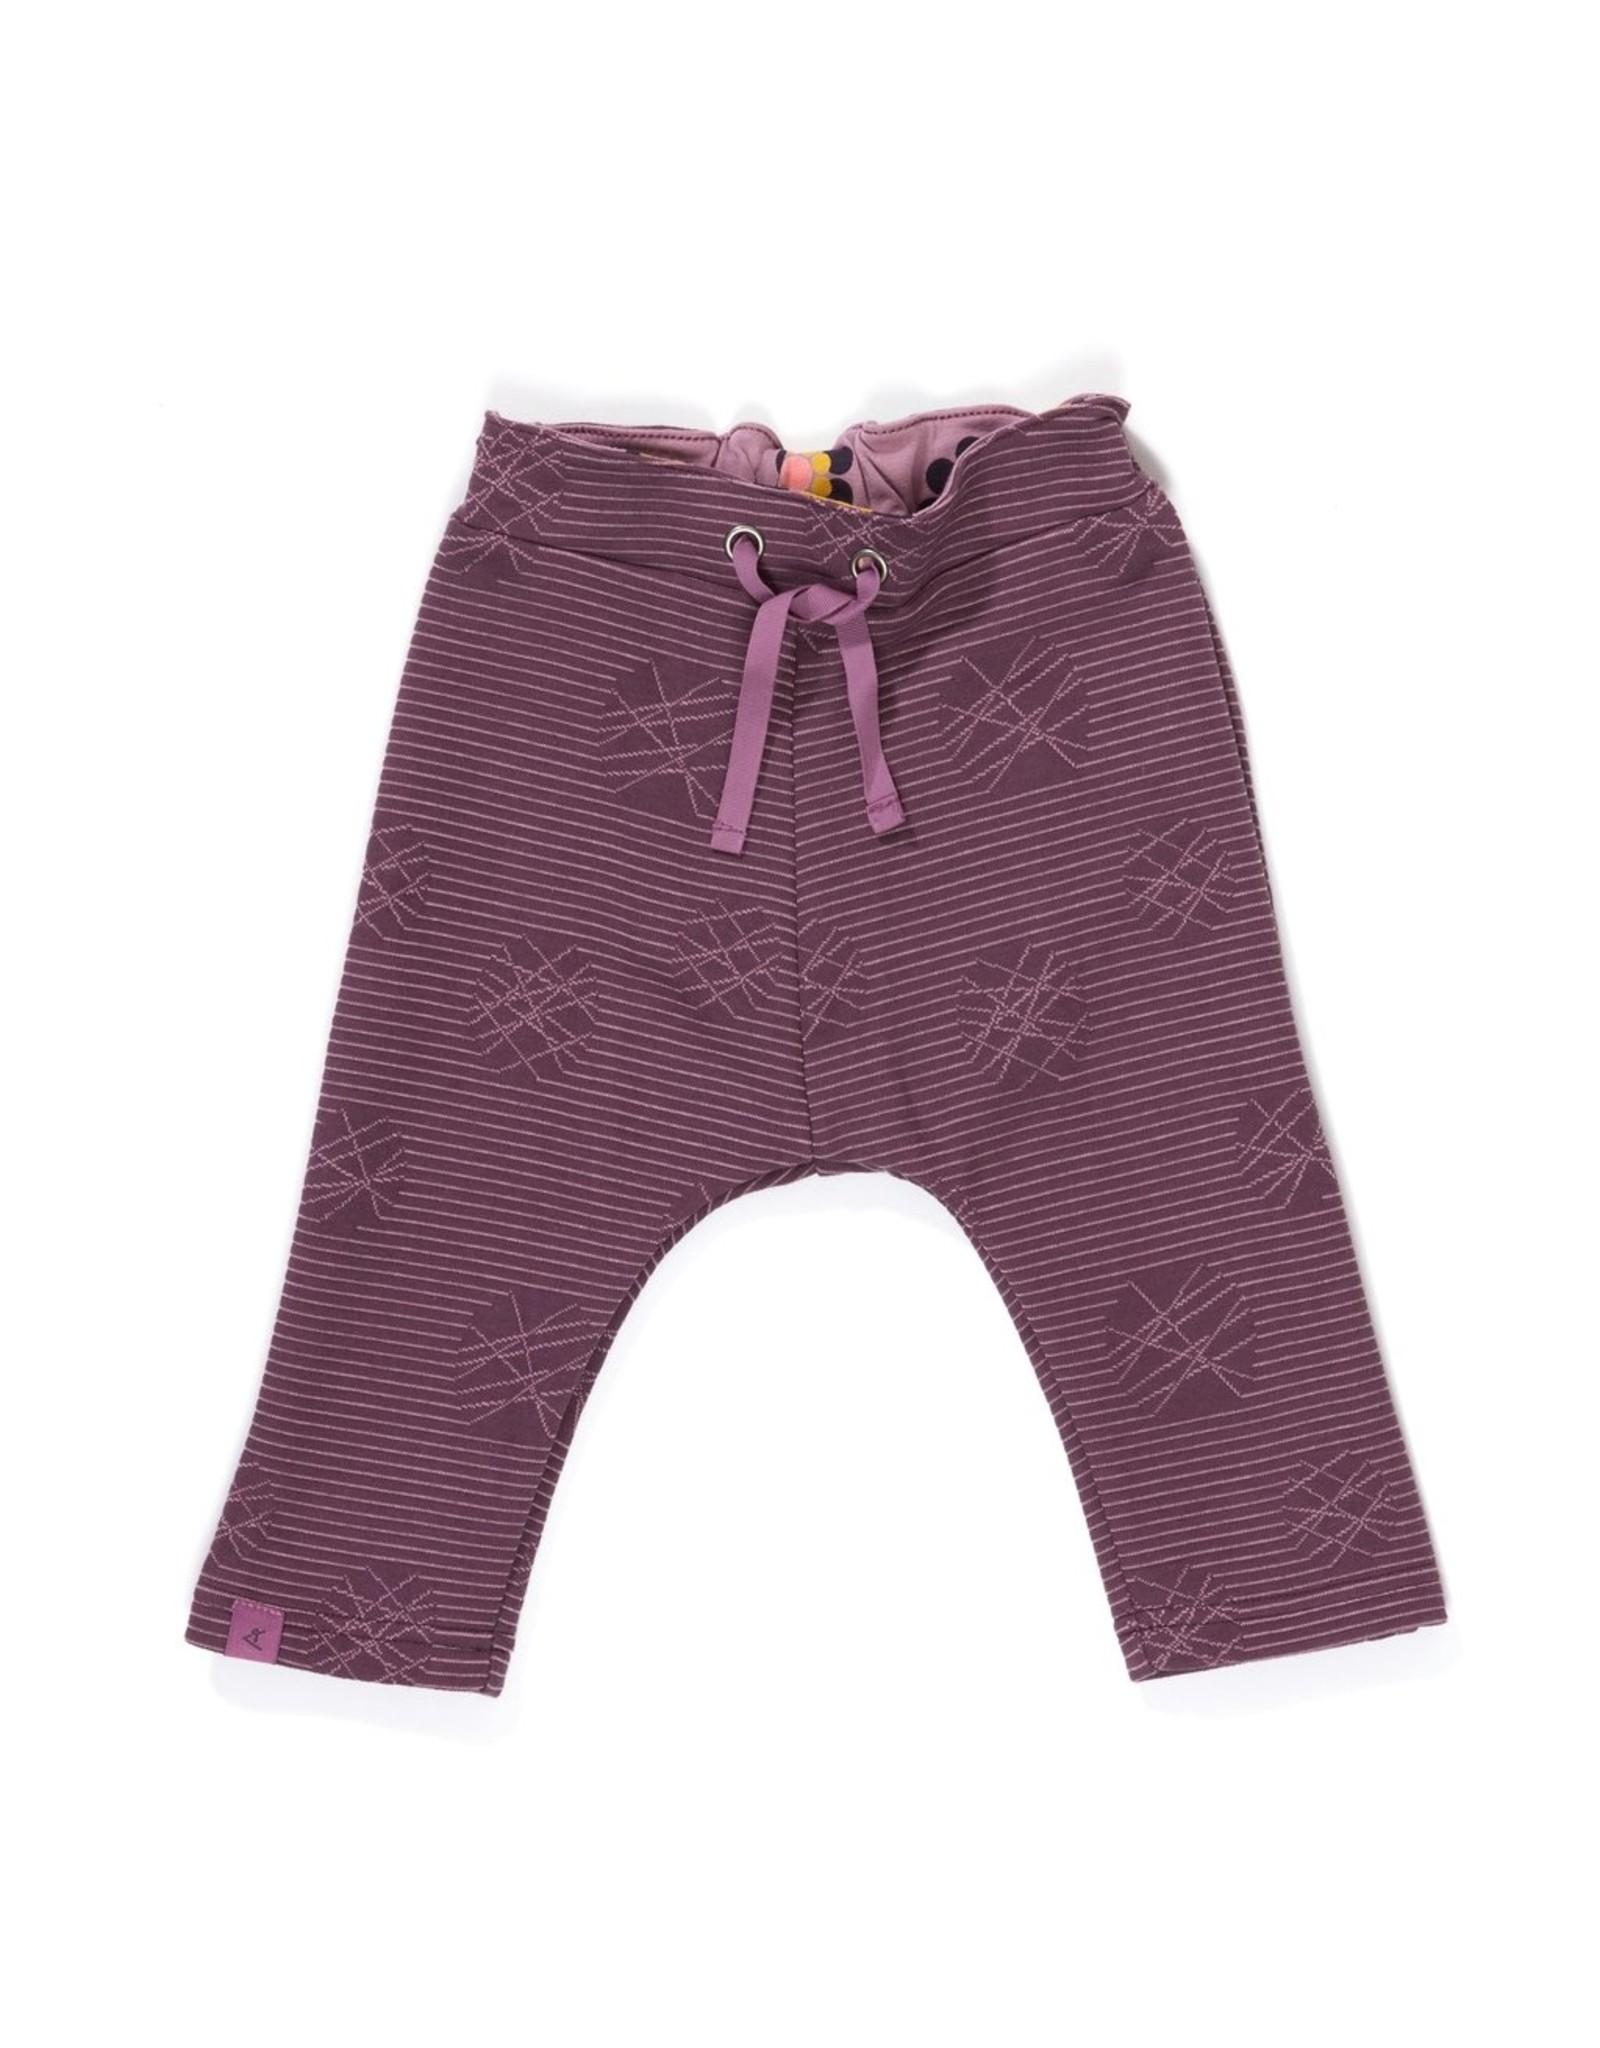 Albababy Alba baby pants - halian baby pants